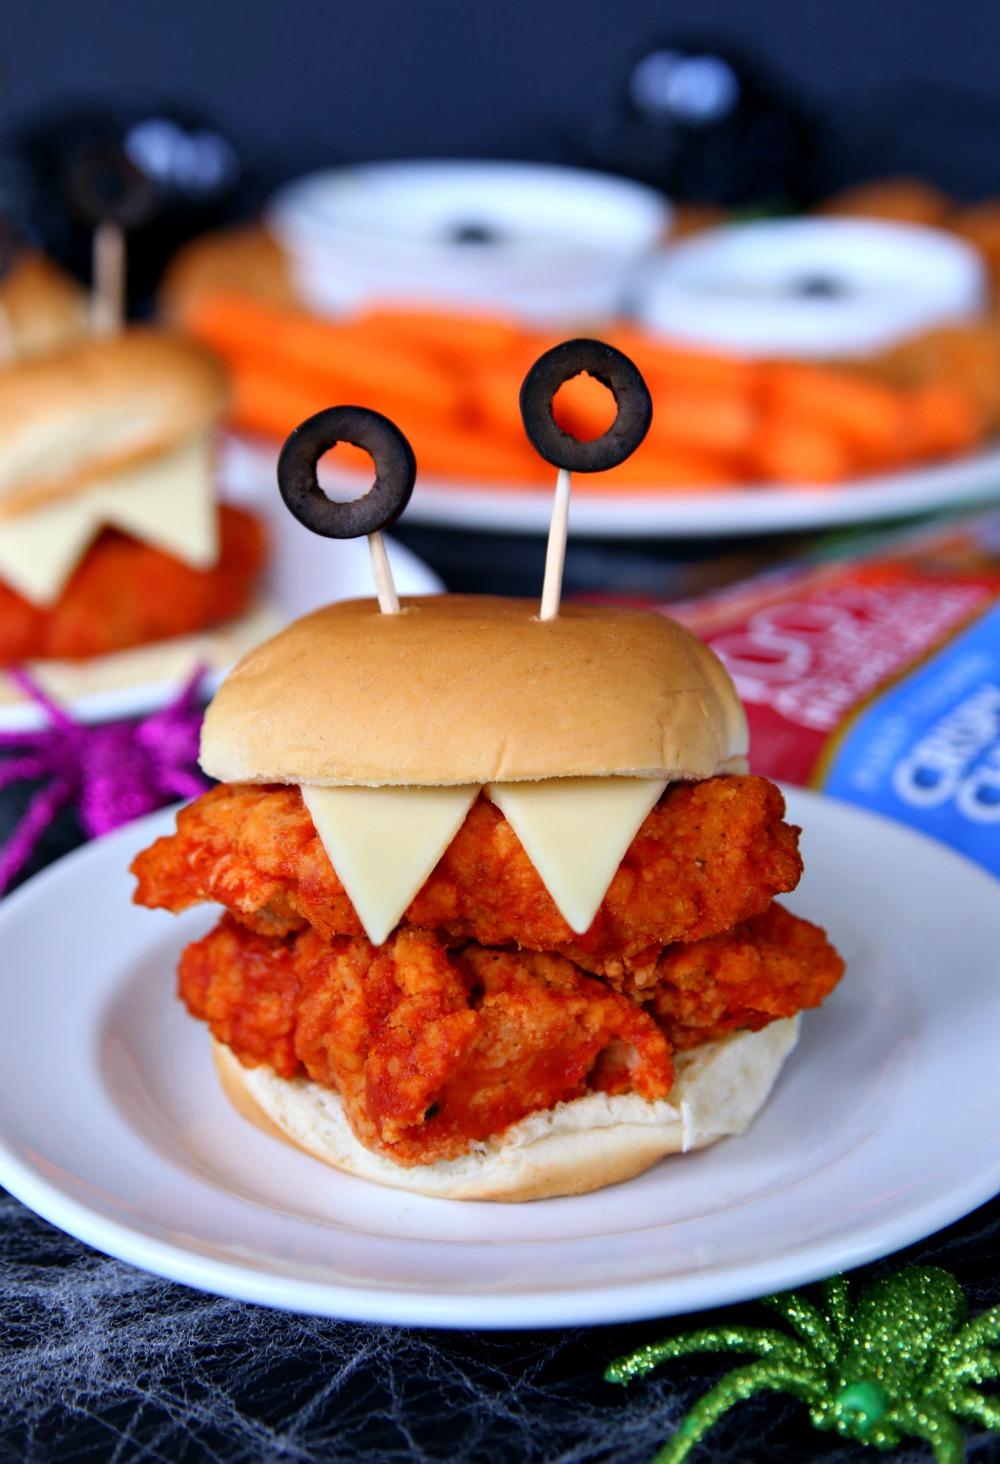 Halloween Appetizer Chicken Sandwiches - A fun Halloween appetizer perfect for Halloween parties.